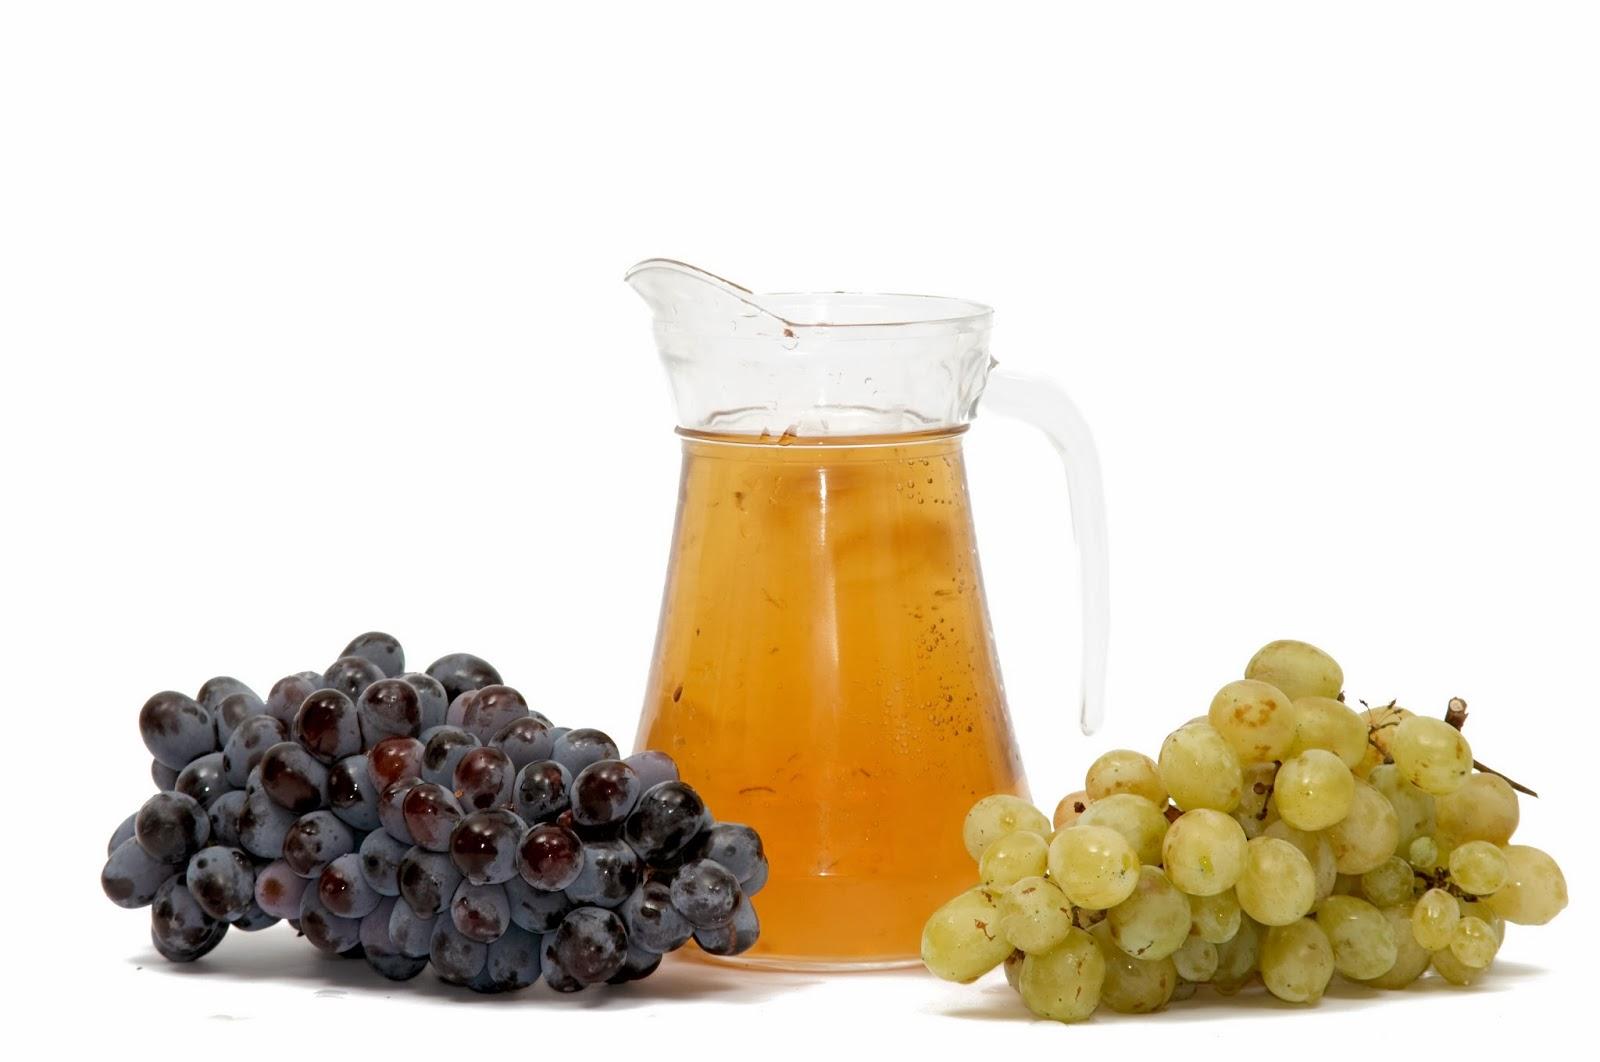 suco natural de uvas